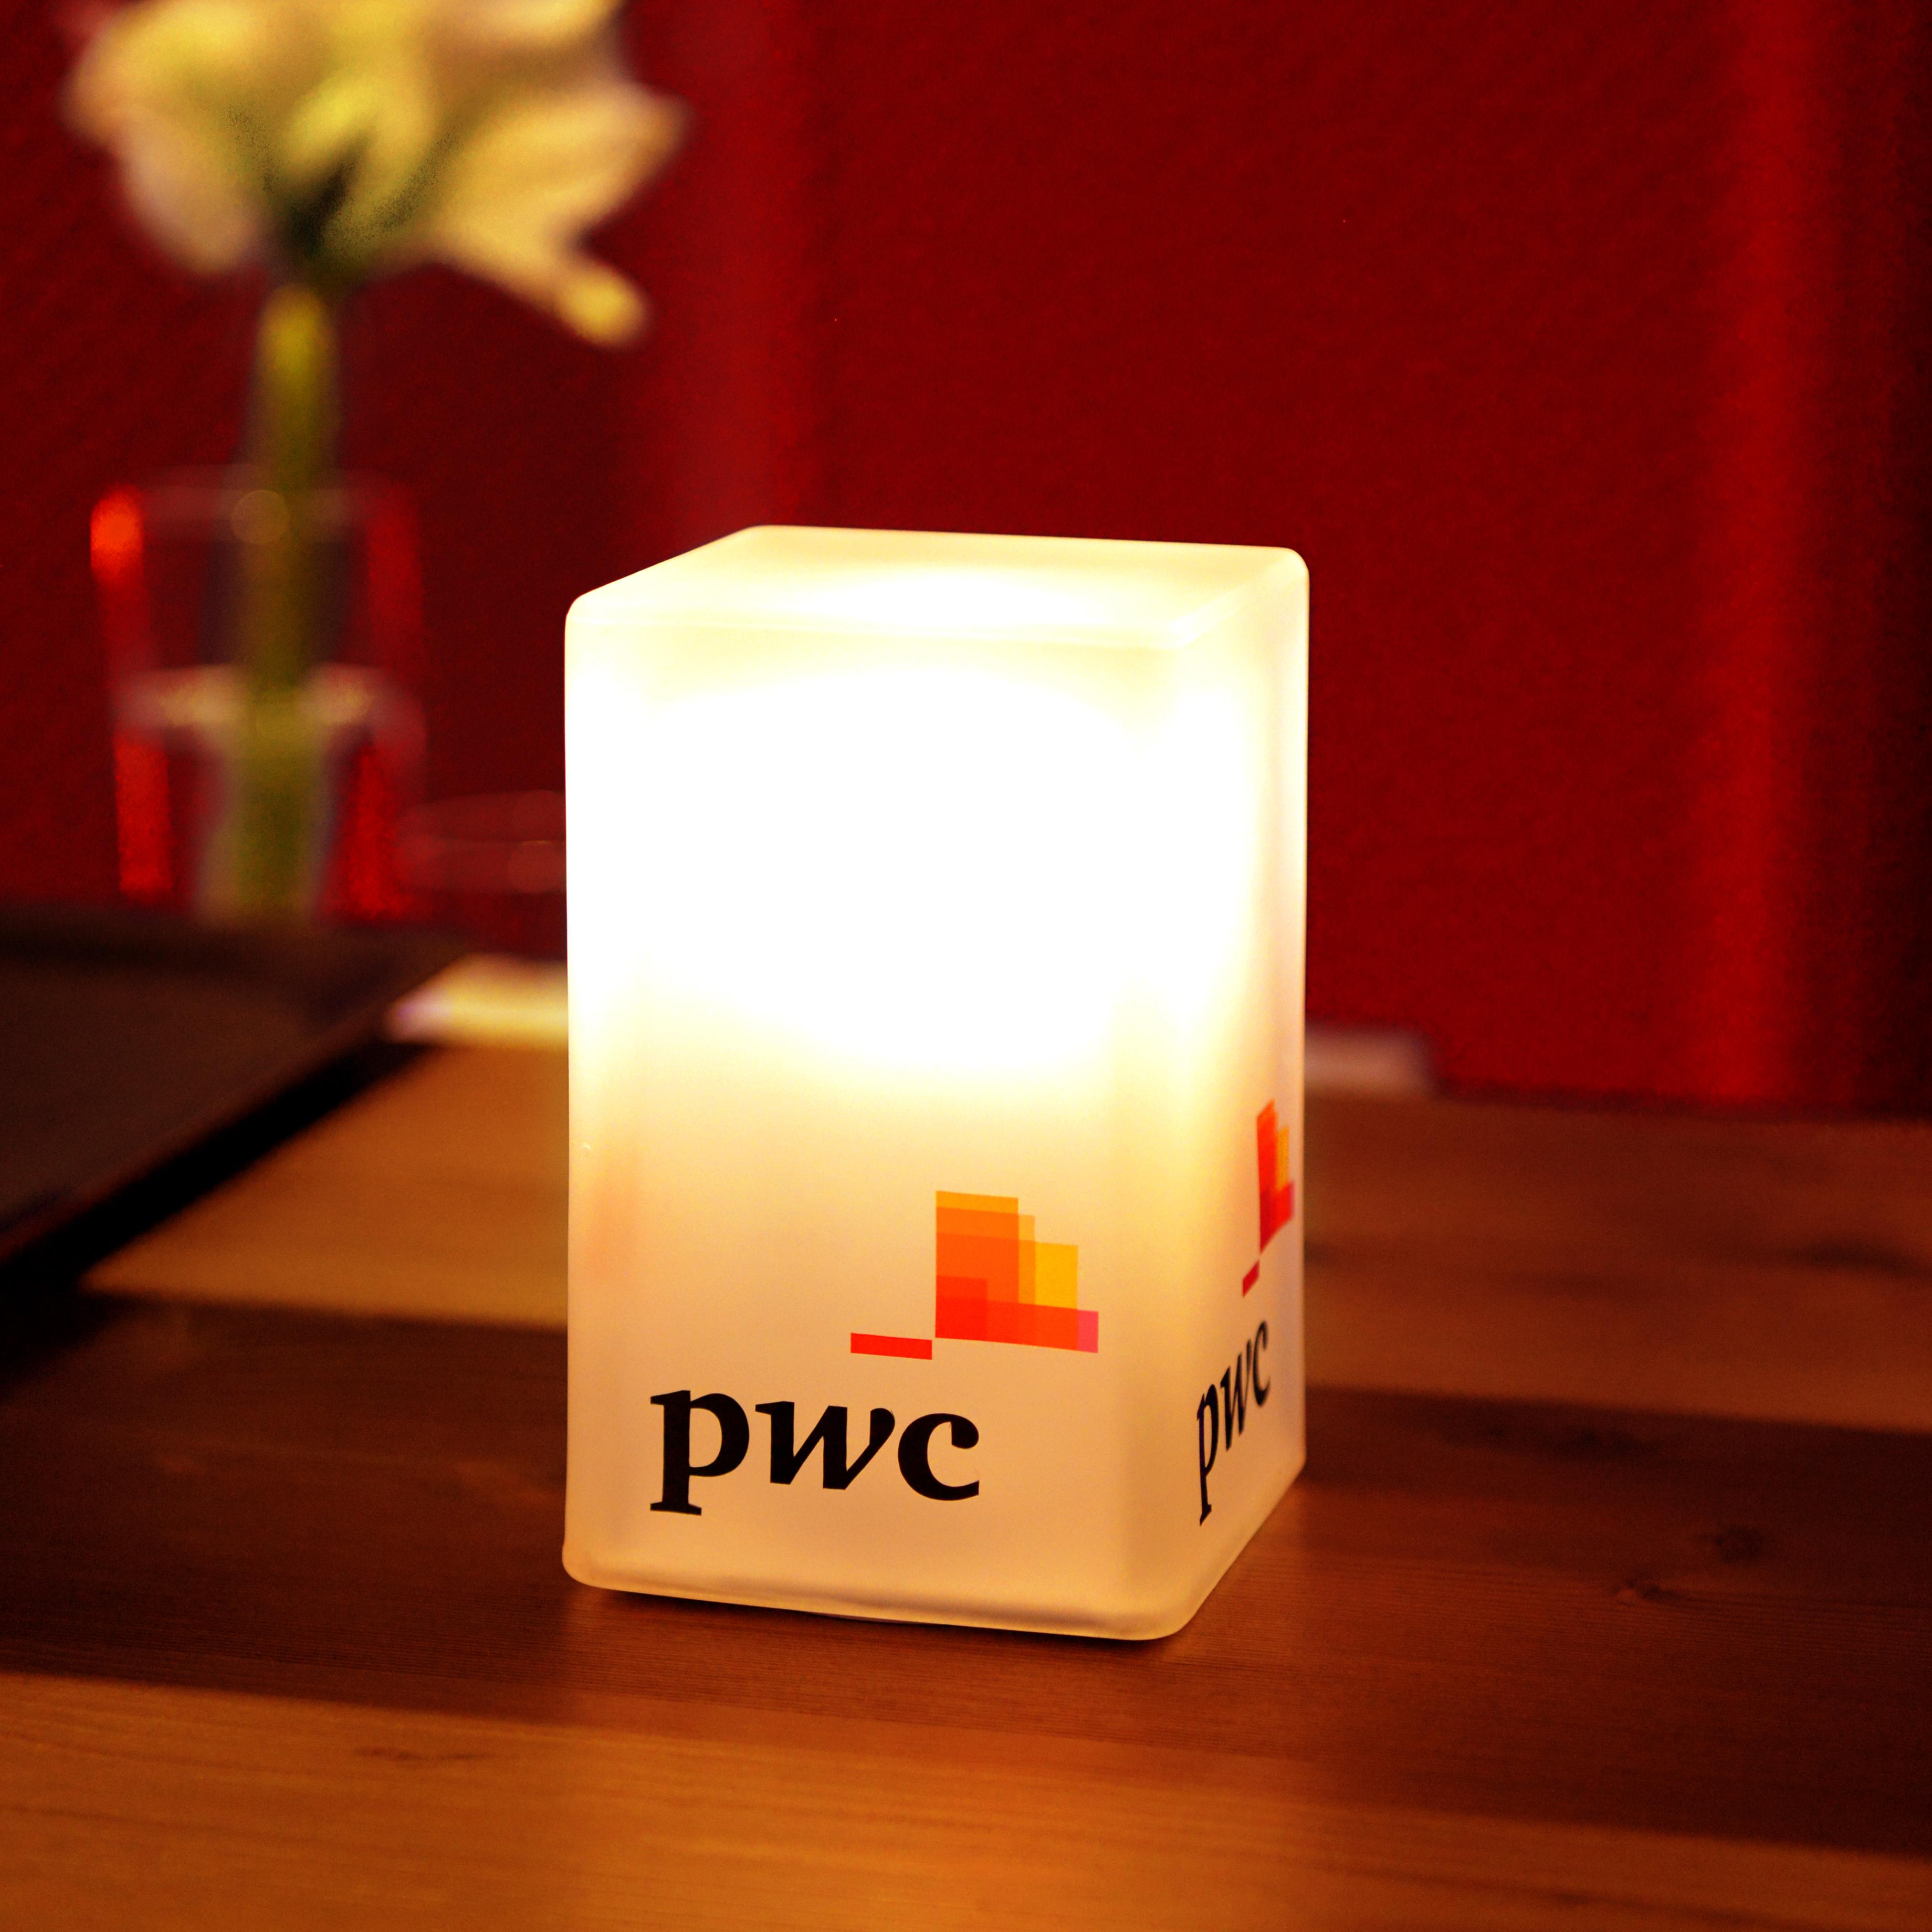 h&p_PWC WEF 2020